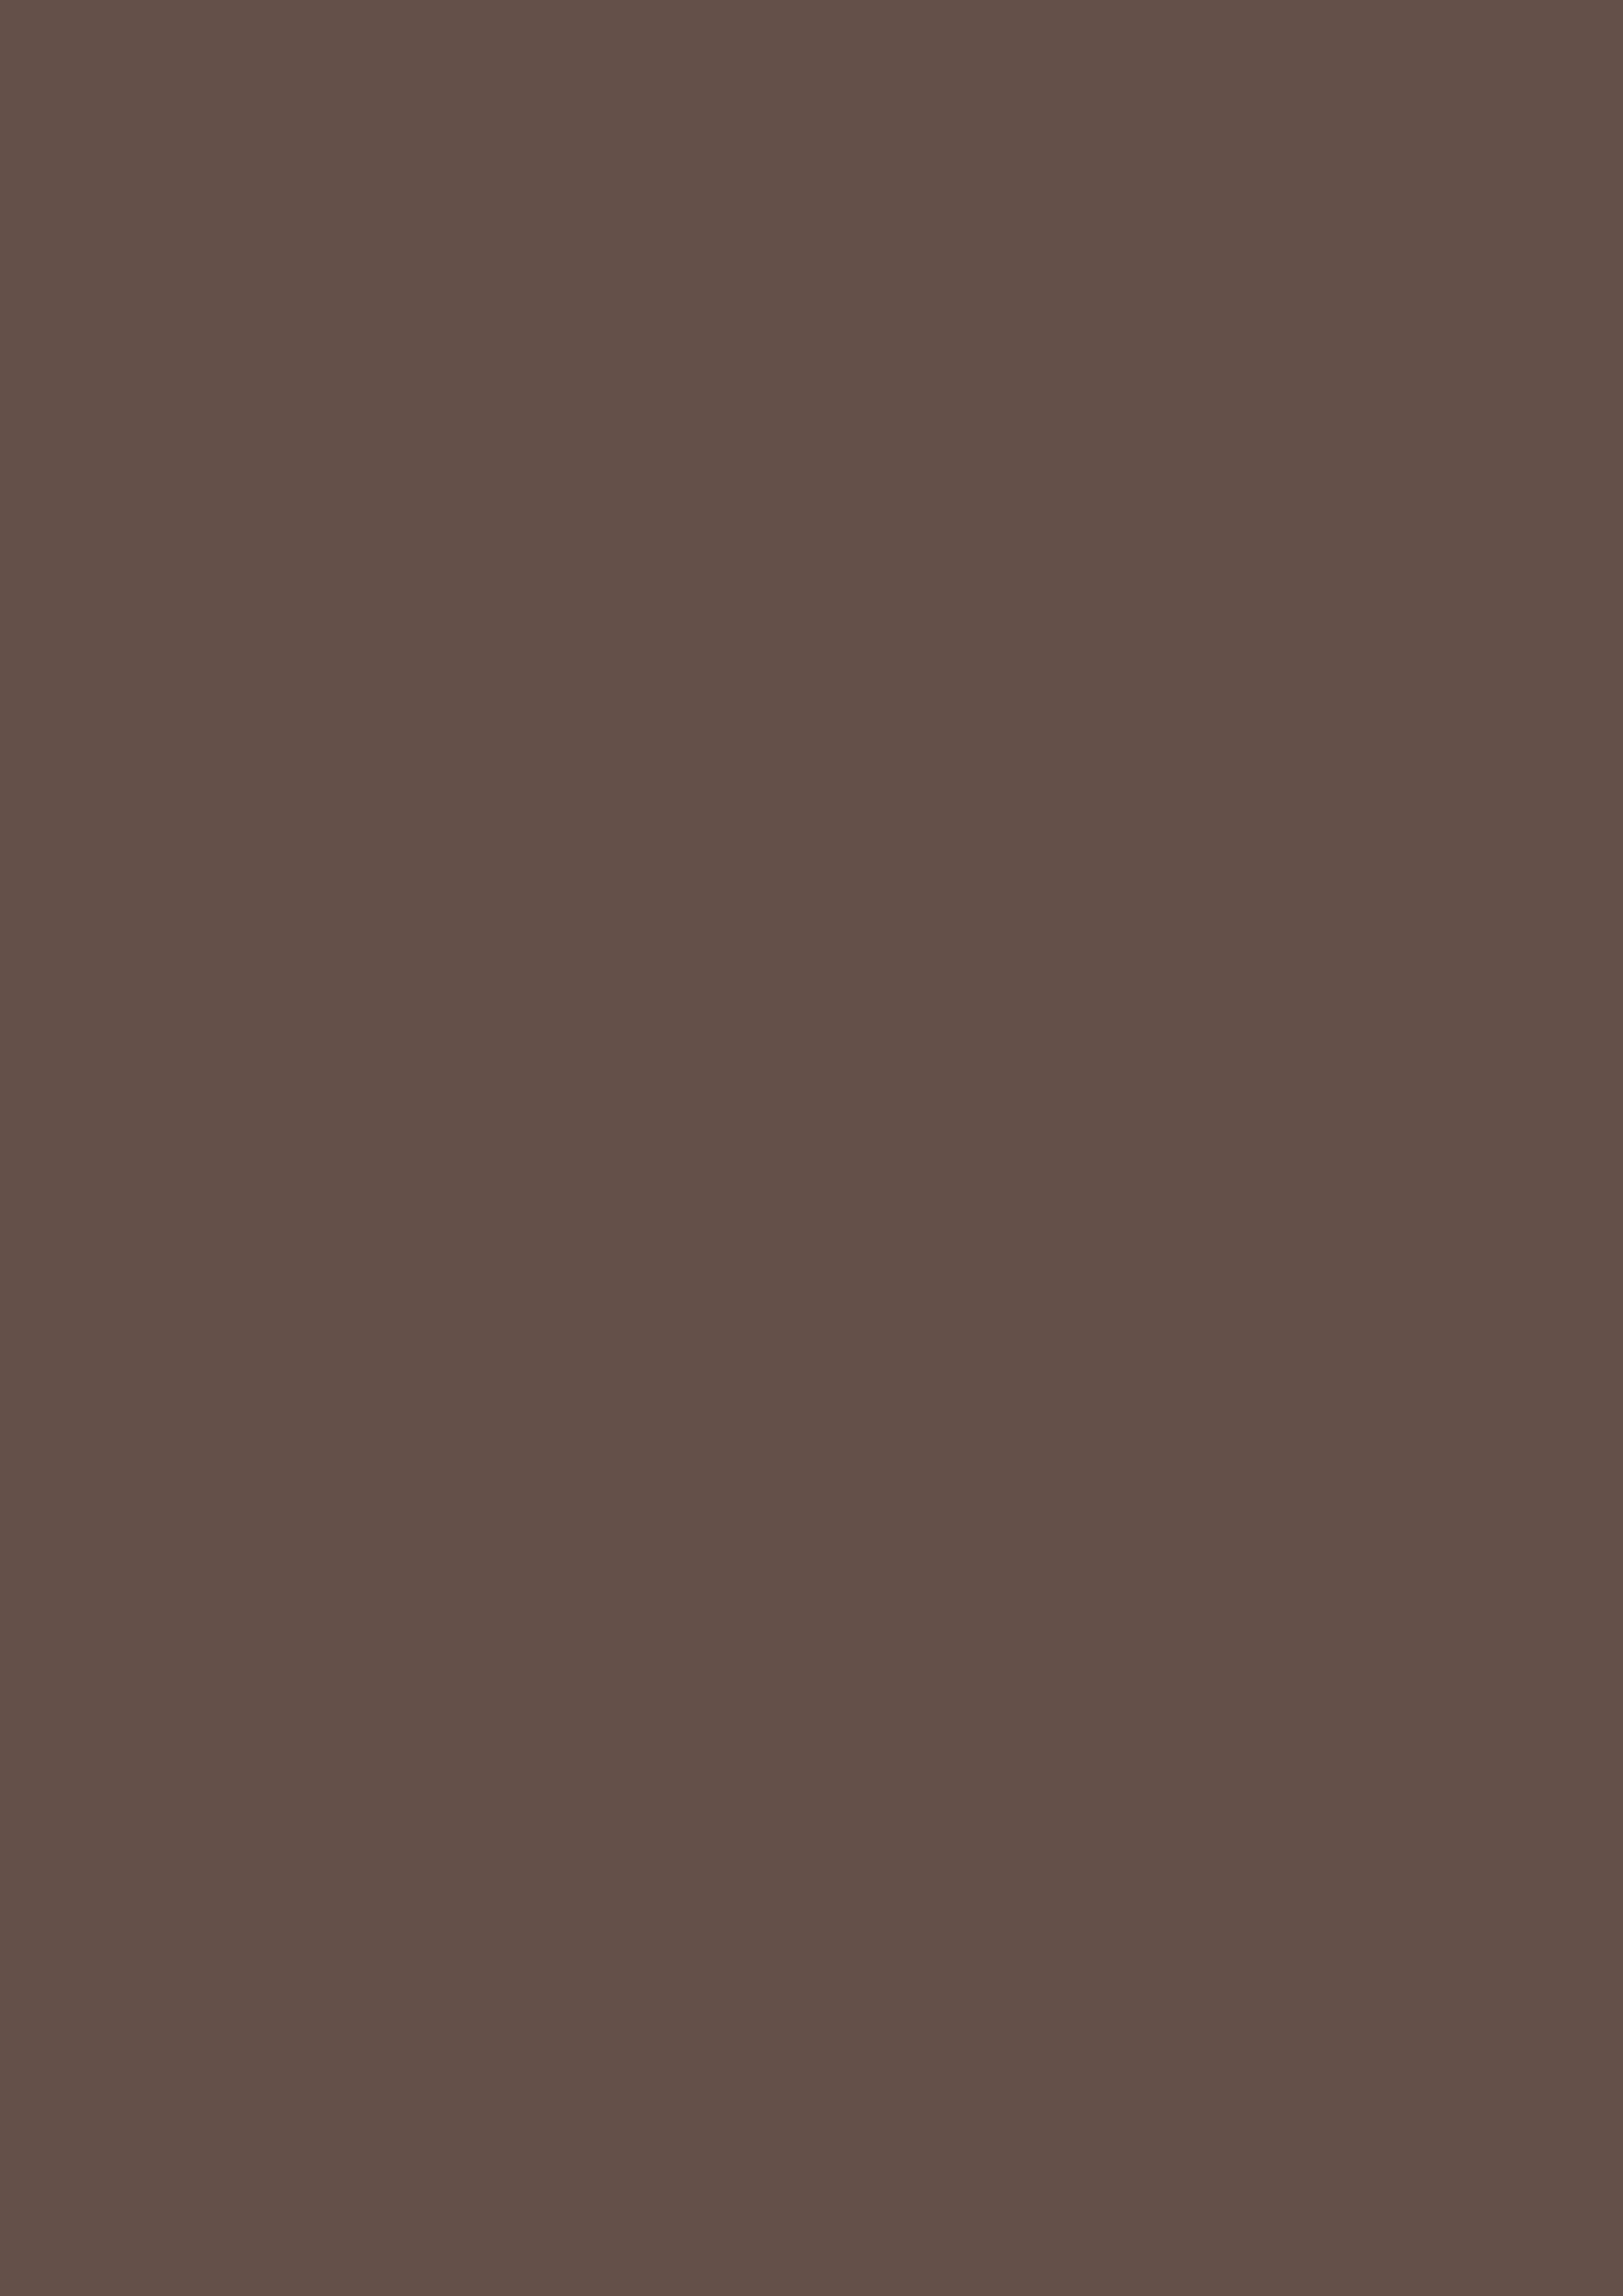 2480x3508 Umber Solid Color Background